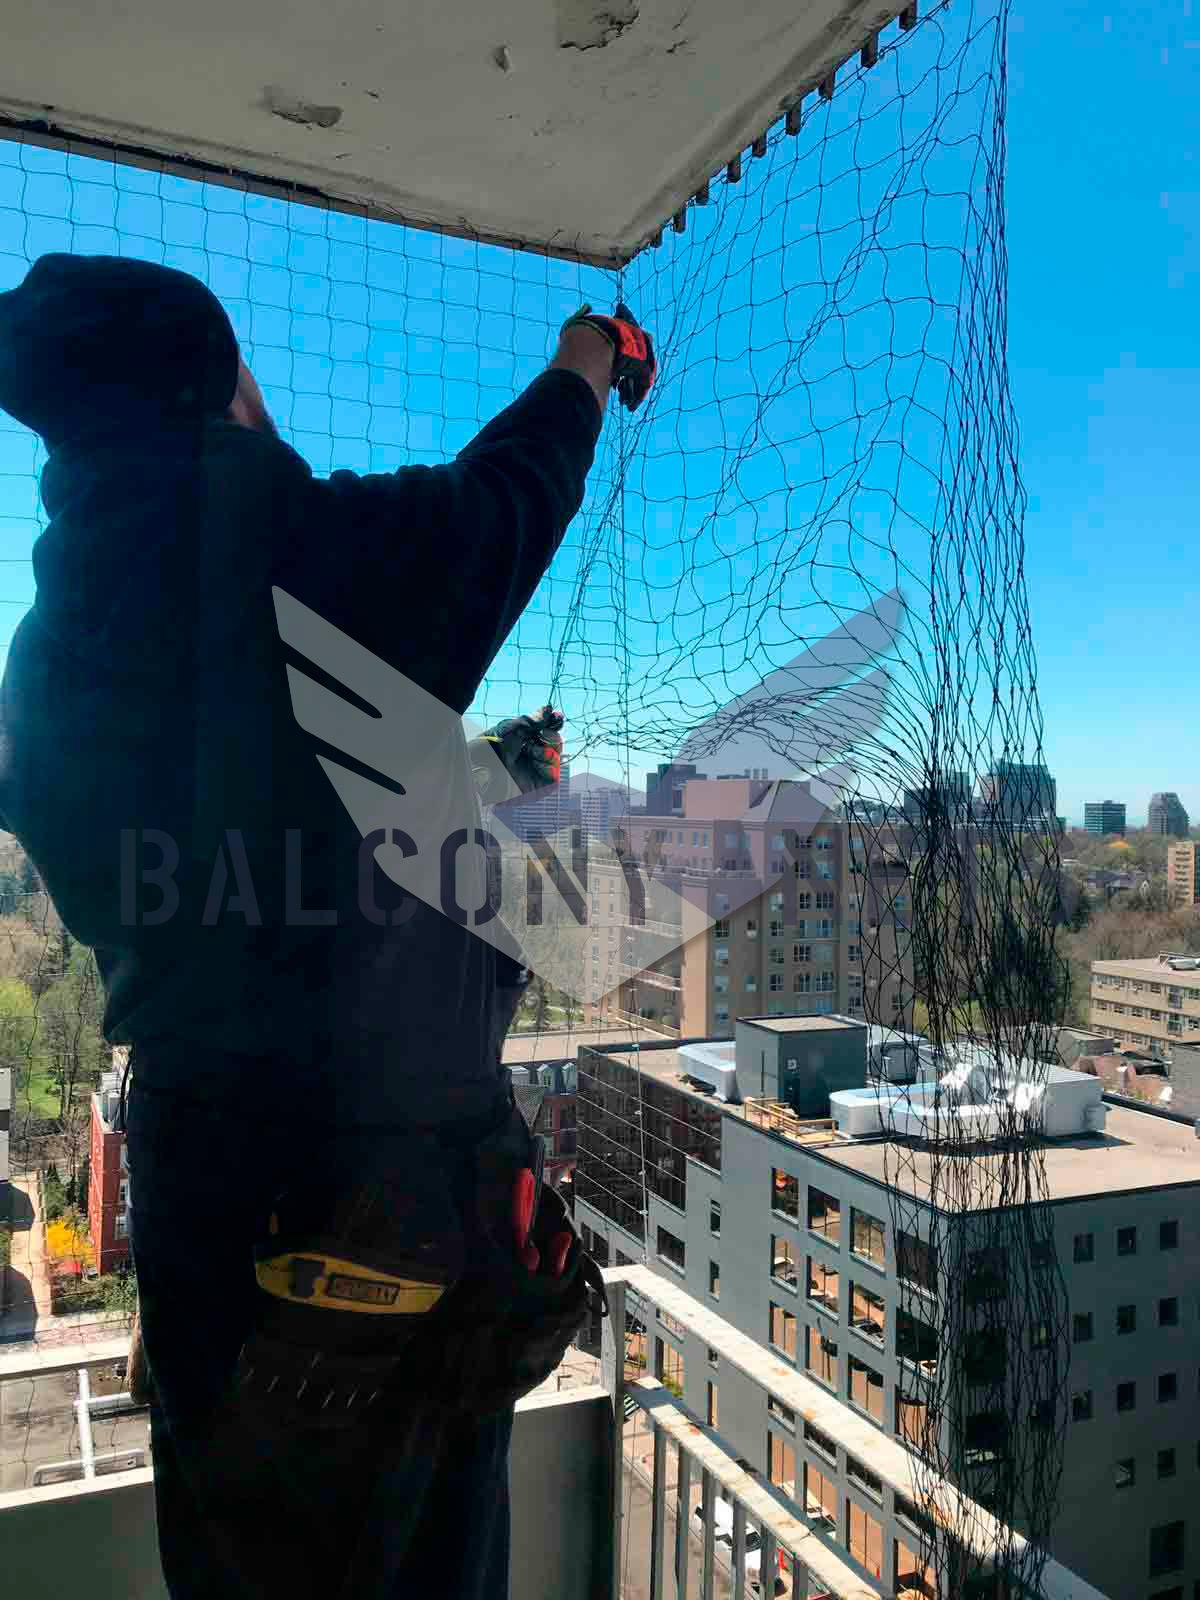 pigeon netting for balconies balcony nets